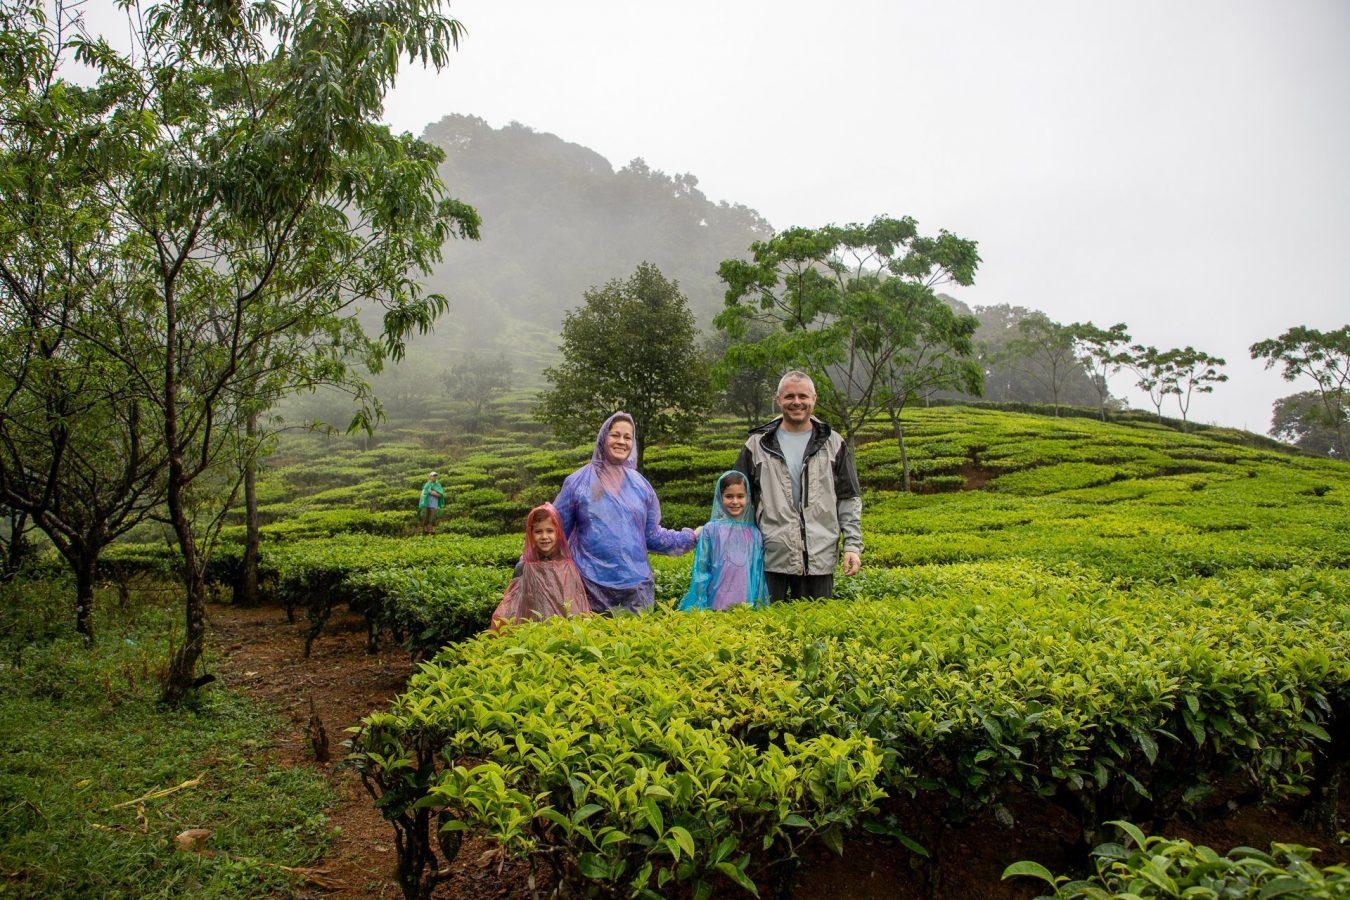 Strolling through the Tea Plantation